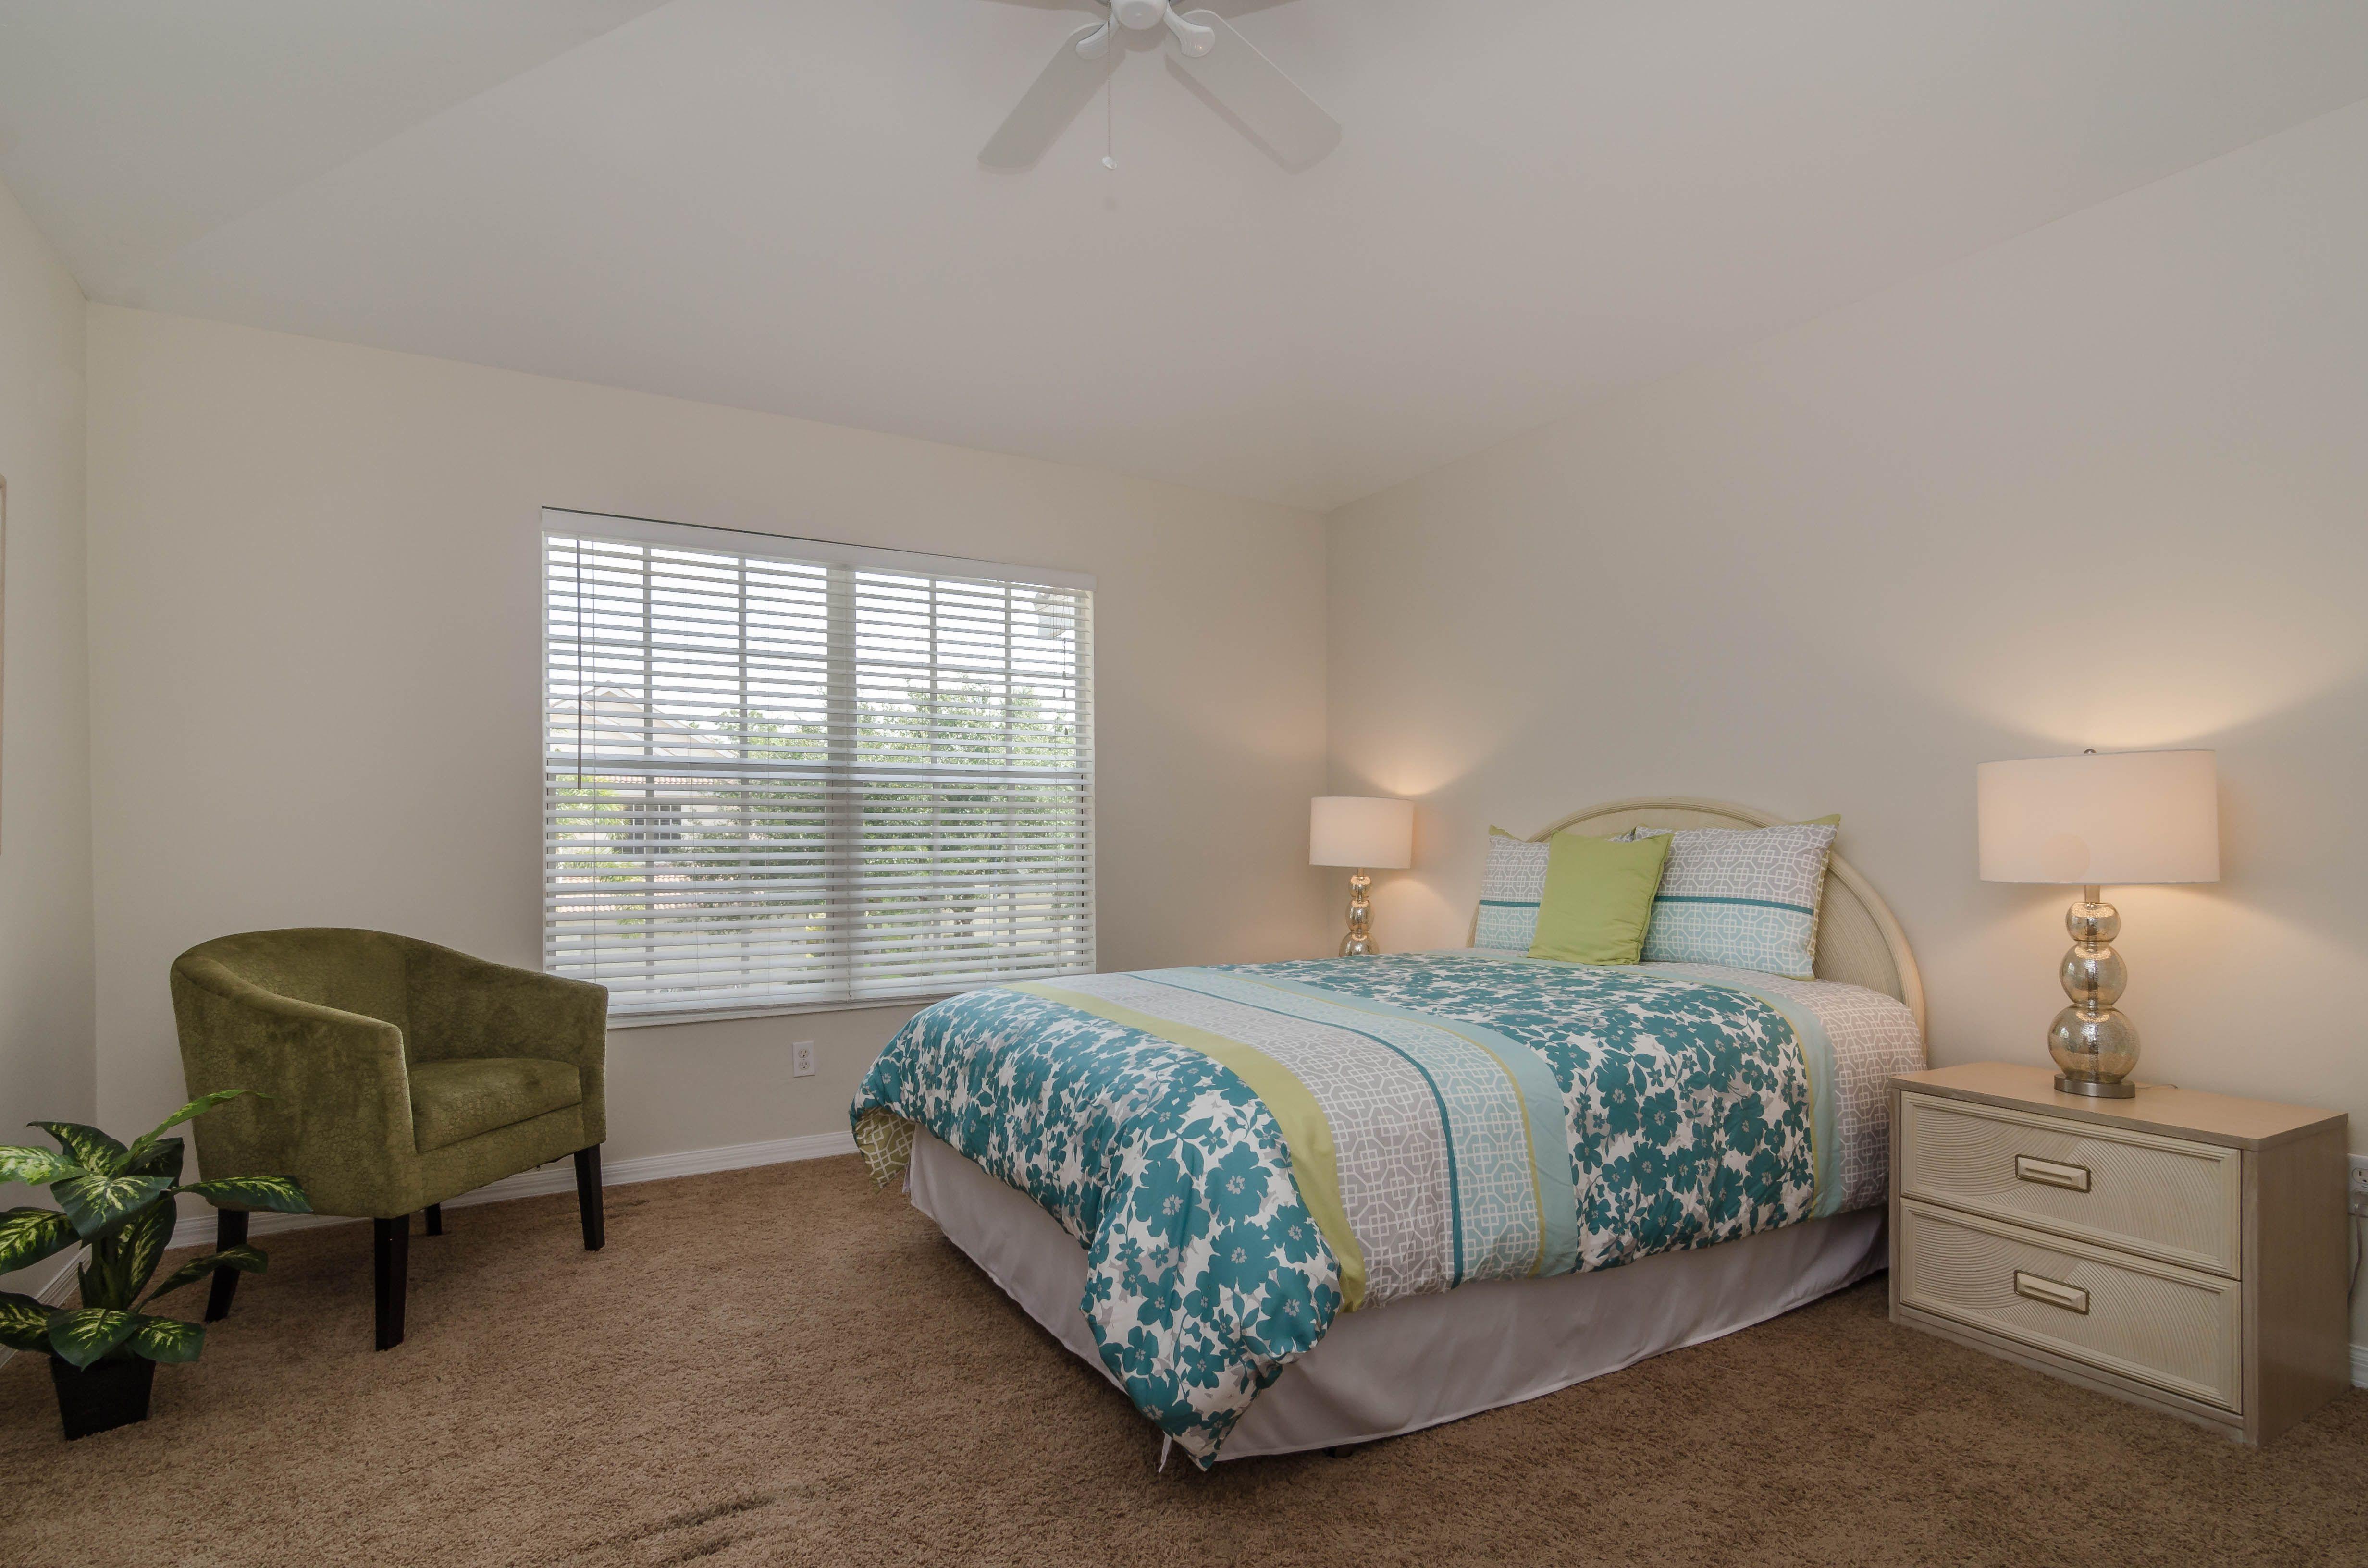 Guest Bedroom 1 | Condos for sale, Guest bedroom, Home